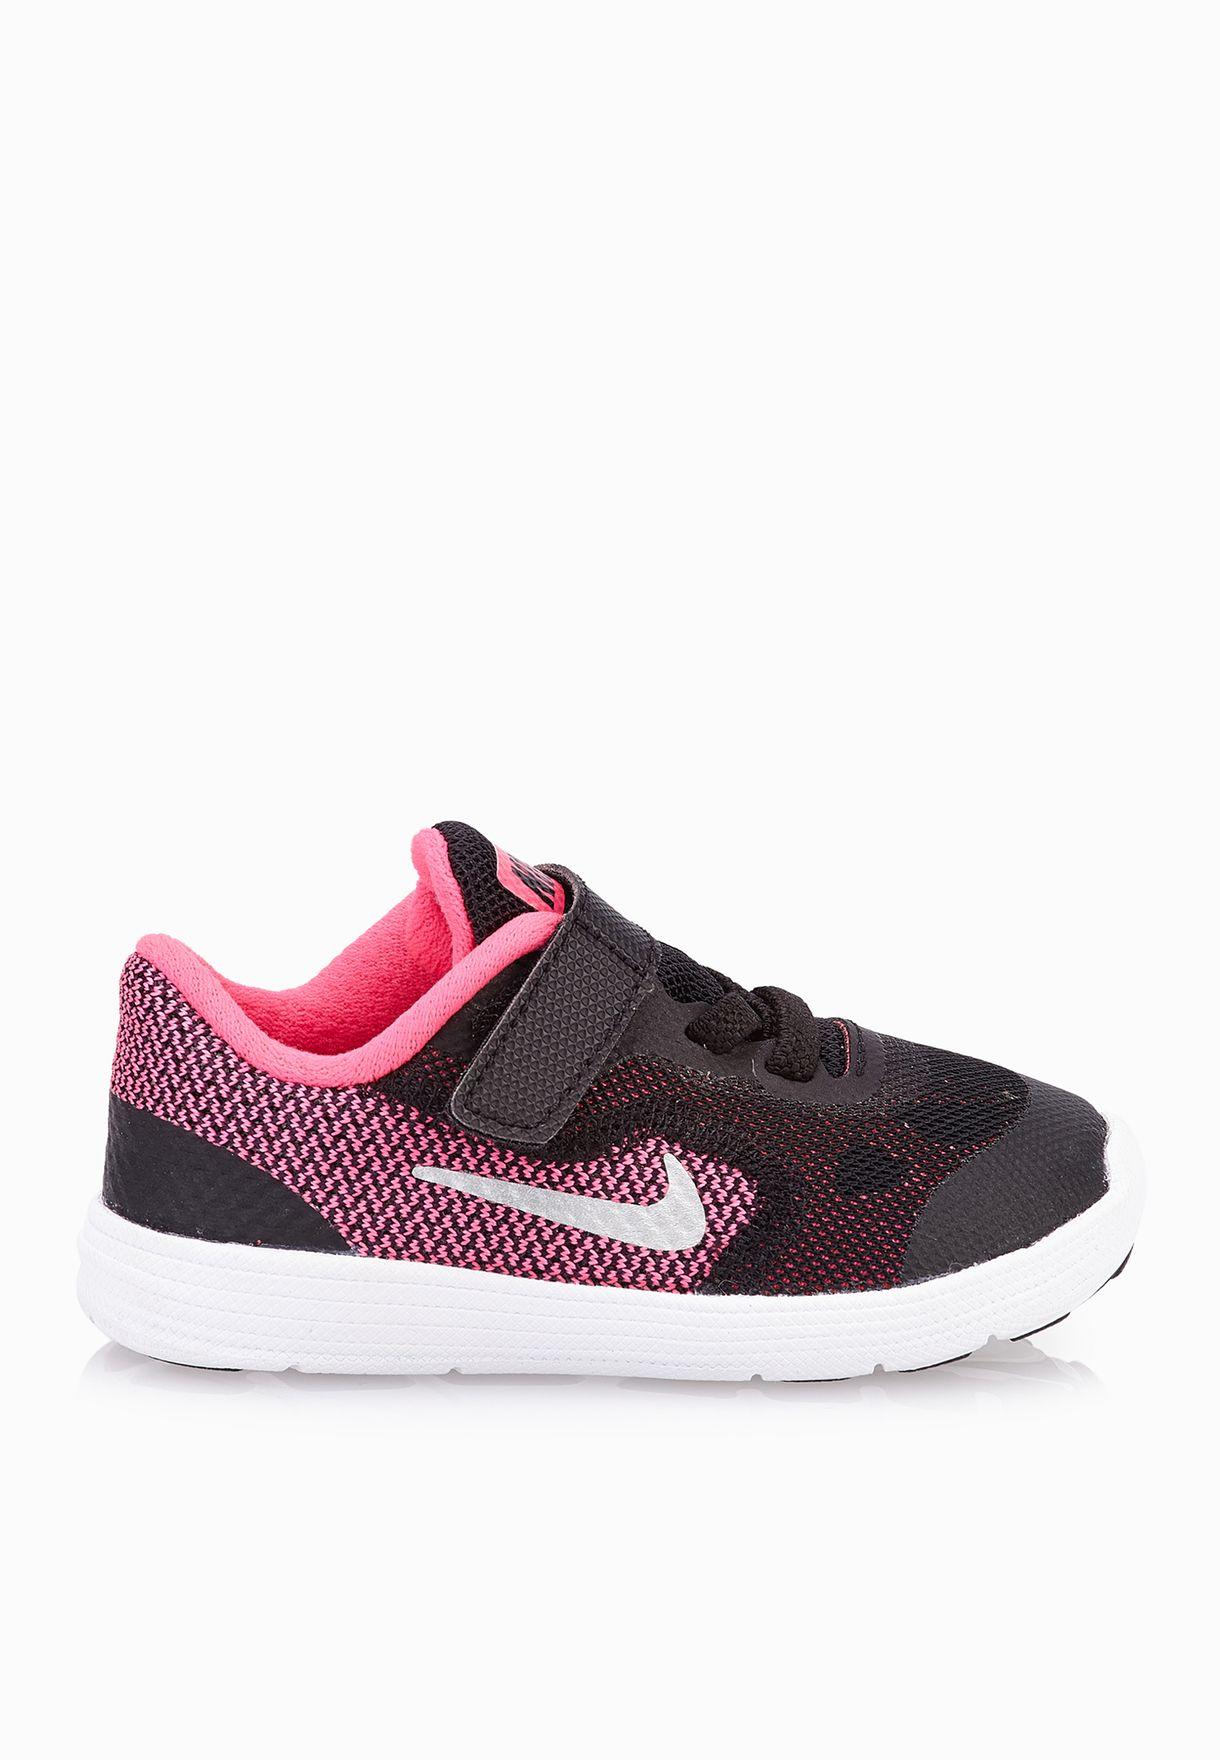 bbe3a8748 تسوق حذاء رياضة Revolution 3 ماركة نايك لون متعدد الألوان 819418-001 ...